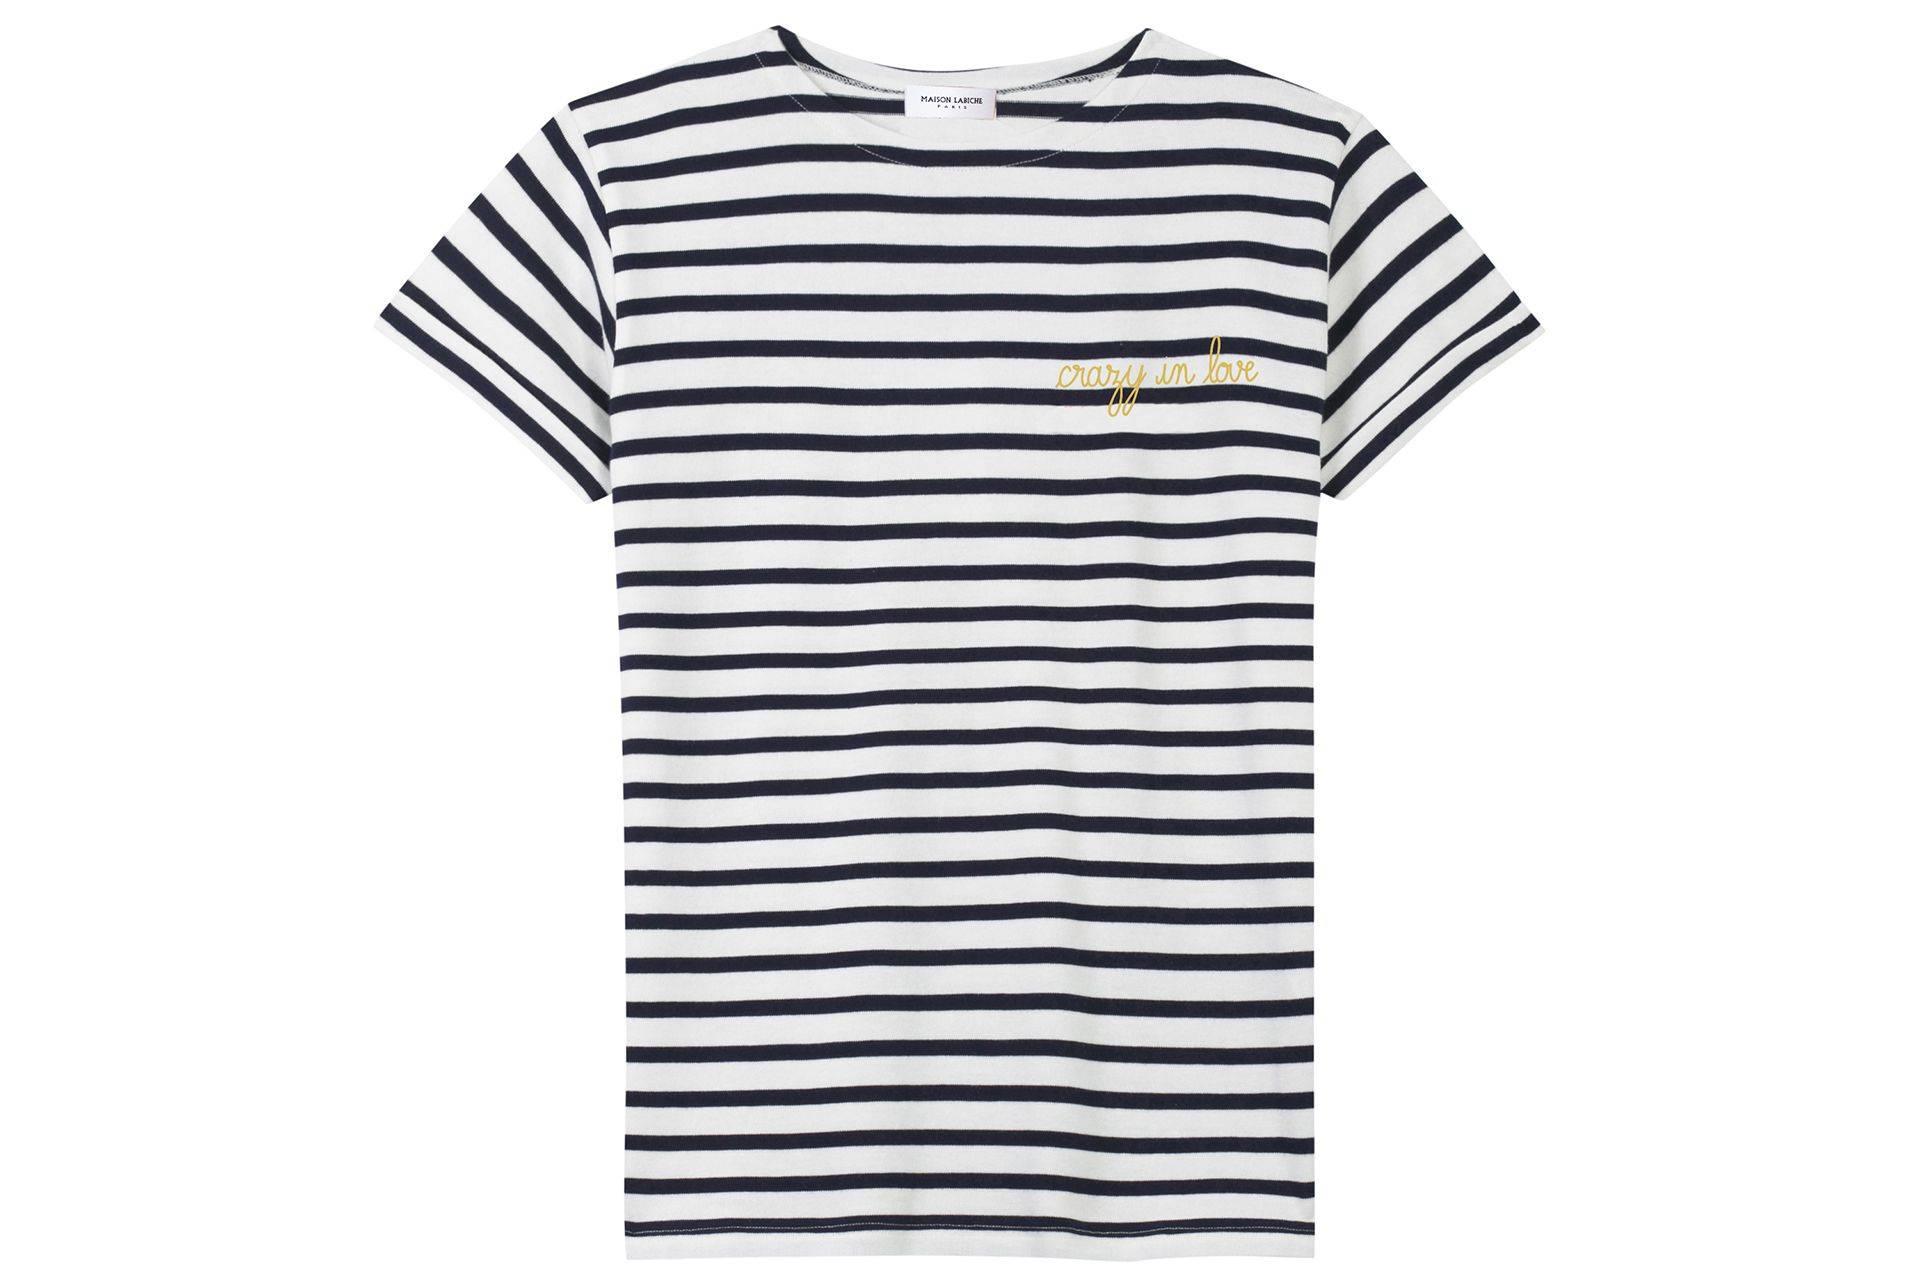 Novelty Slogan Jumpers & T Shirts & Sweatshirts – Valentines Day